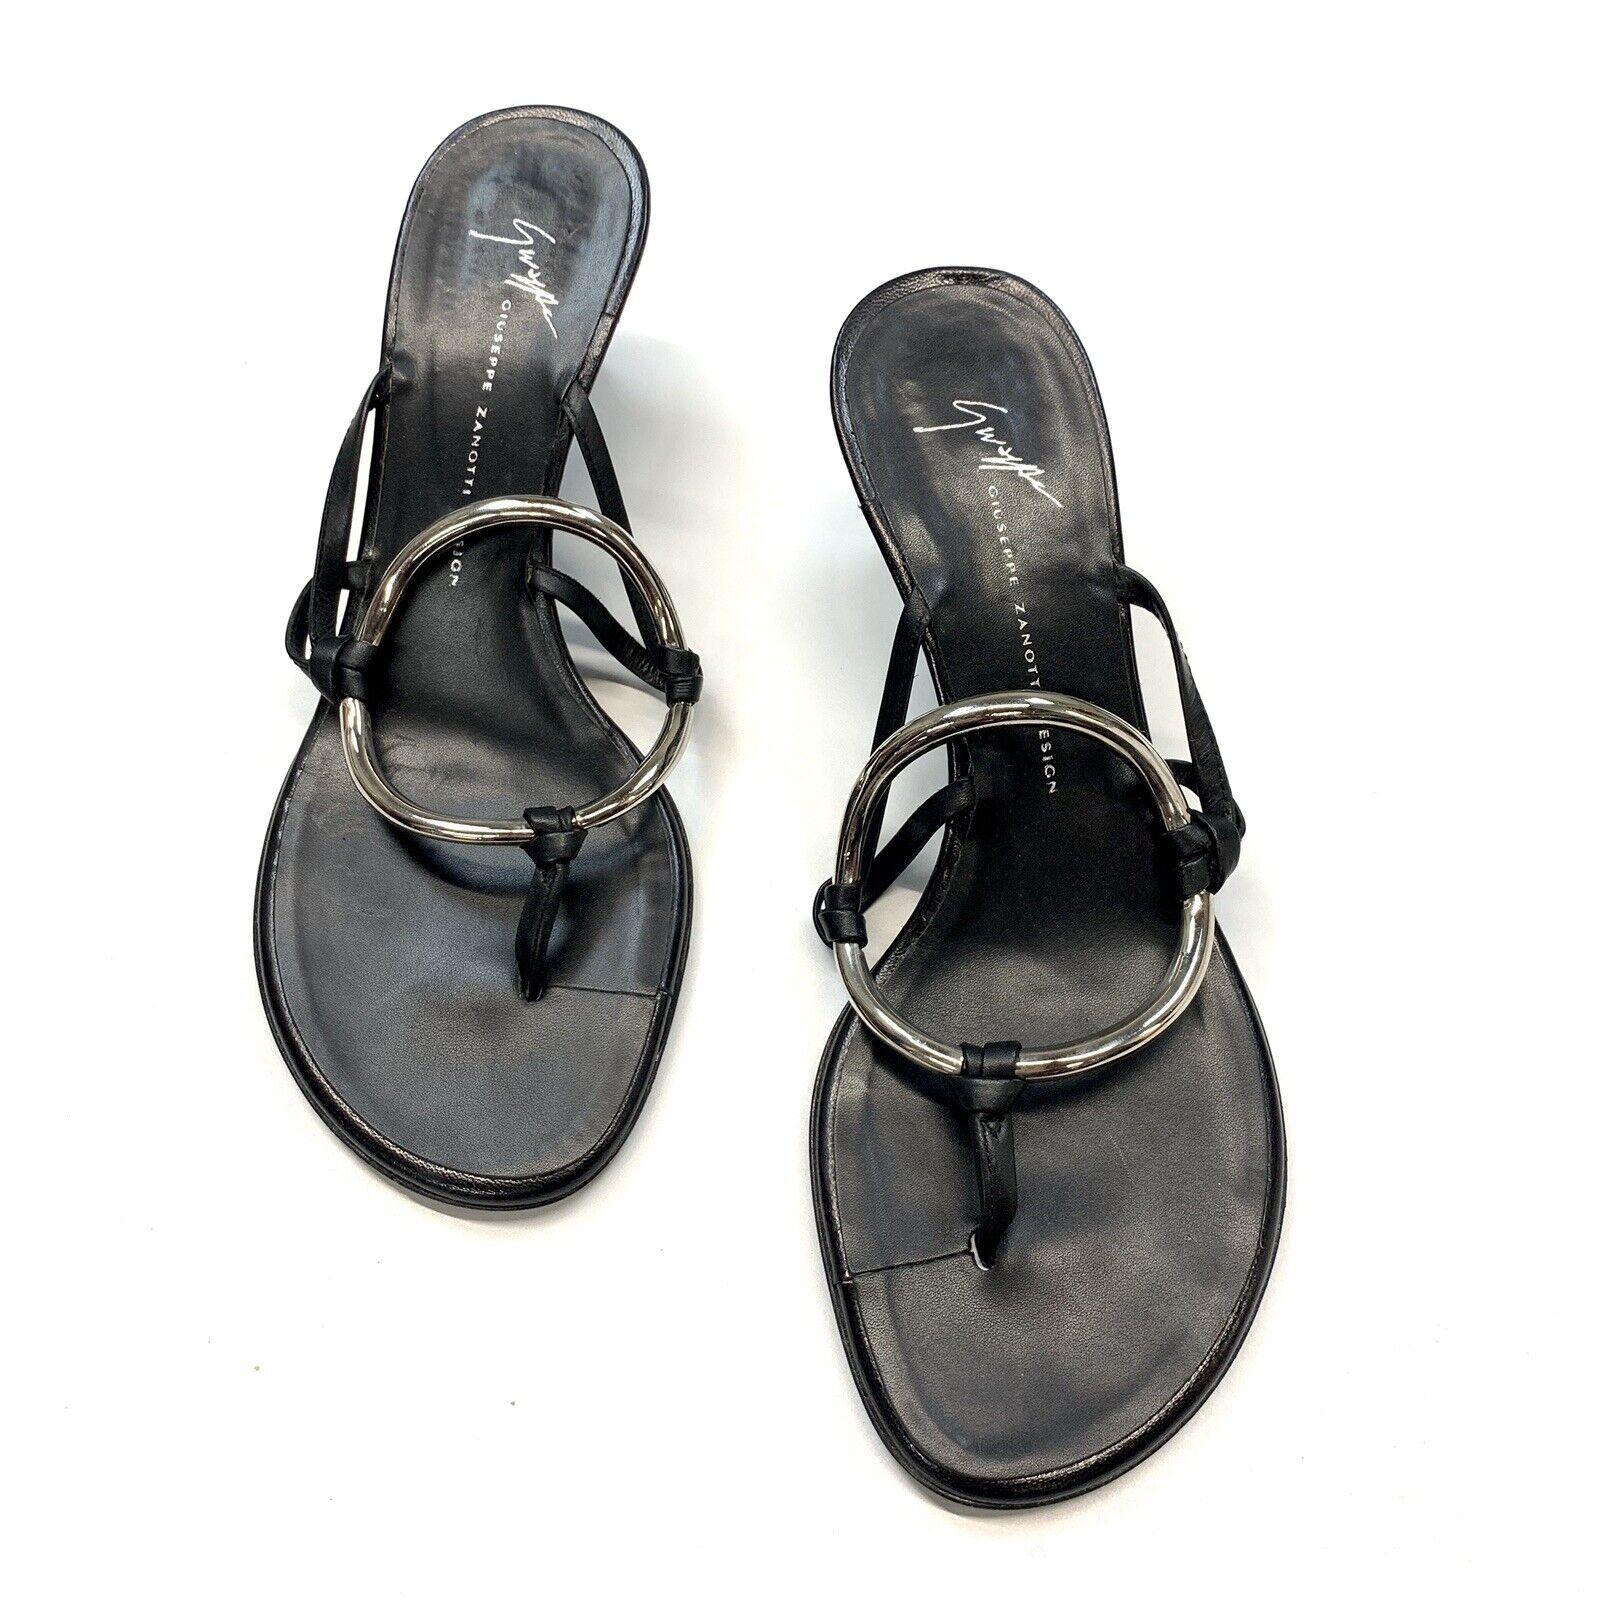 giuseppe zanotti Strappy Sandals - image 1